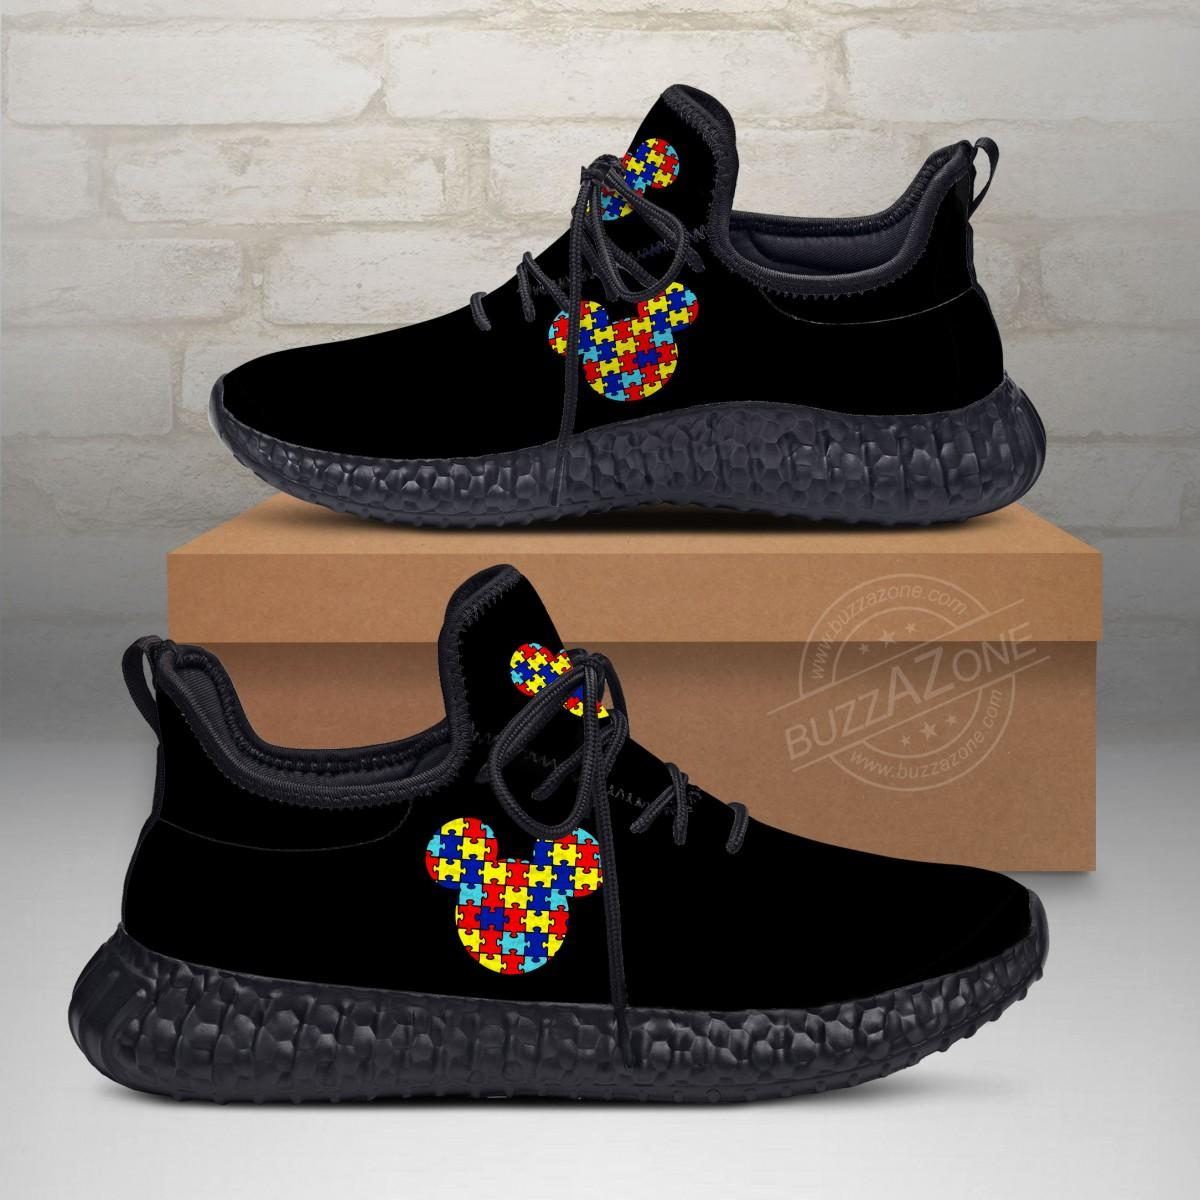 Autism Mickey Custom New Yeezy Sneaker